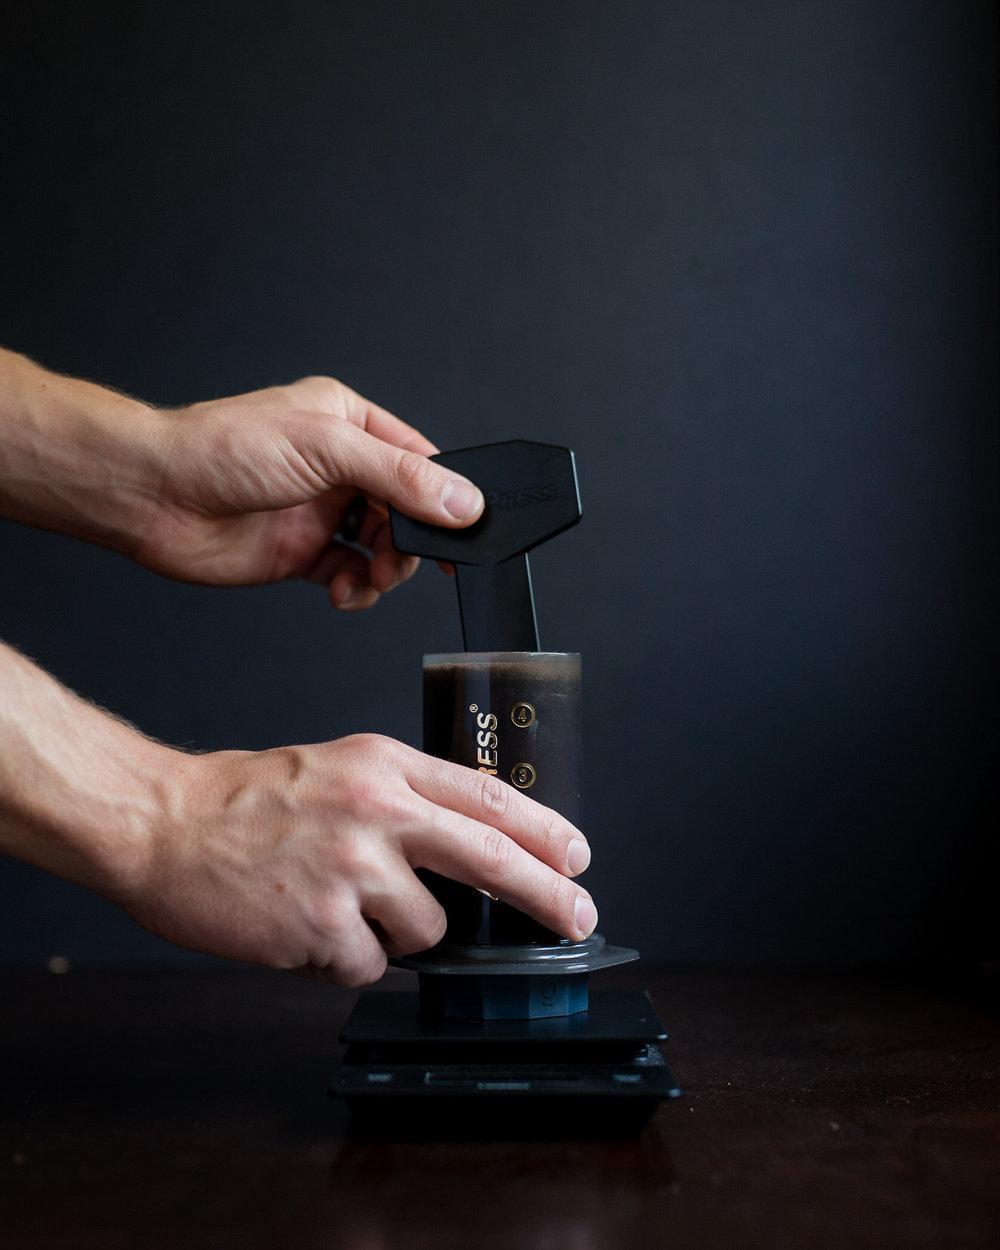 Stir 5 times clockwise